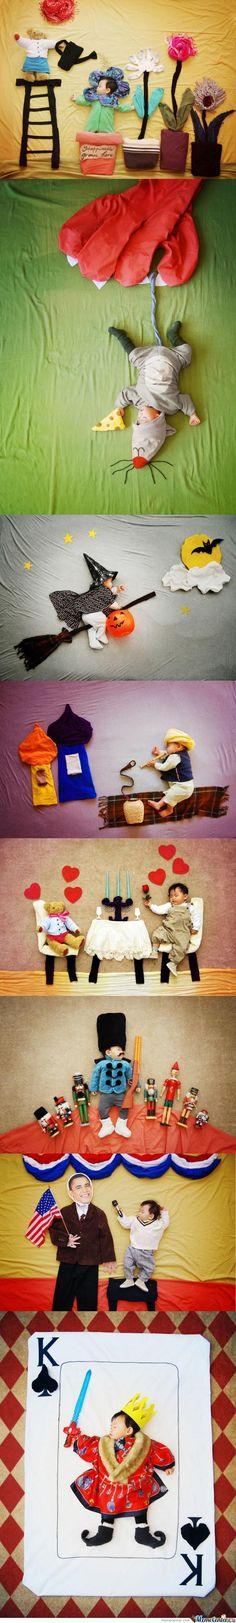 Kids' Dreams #2